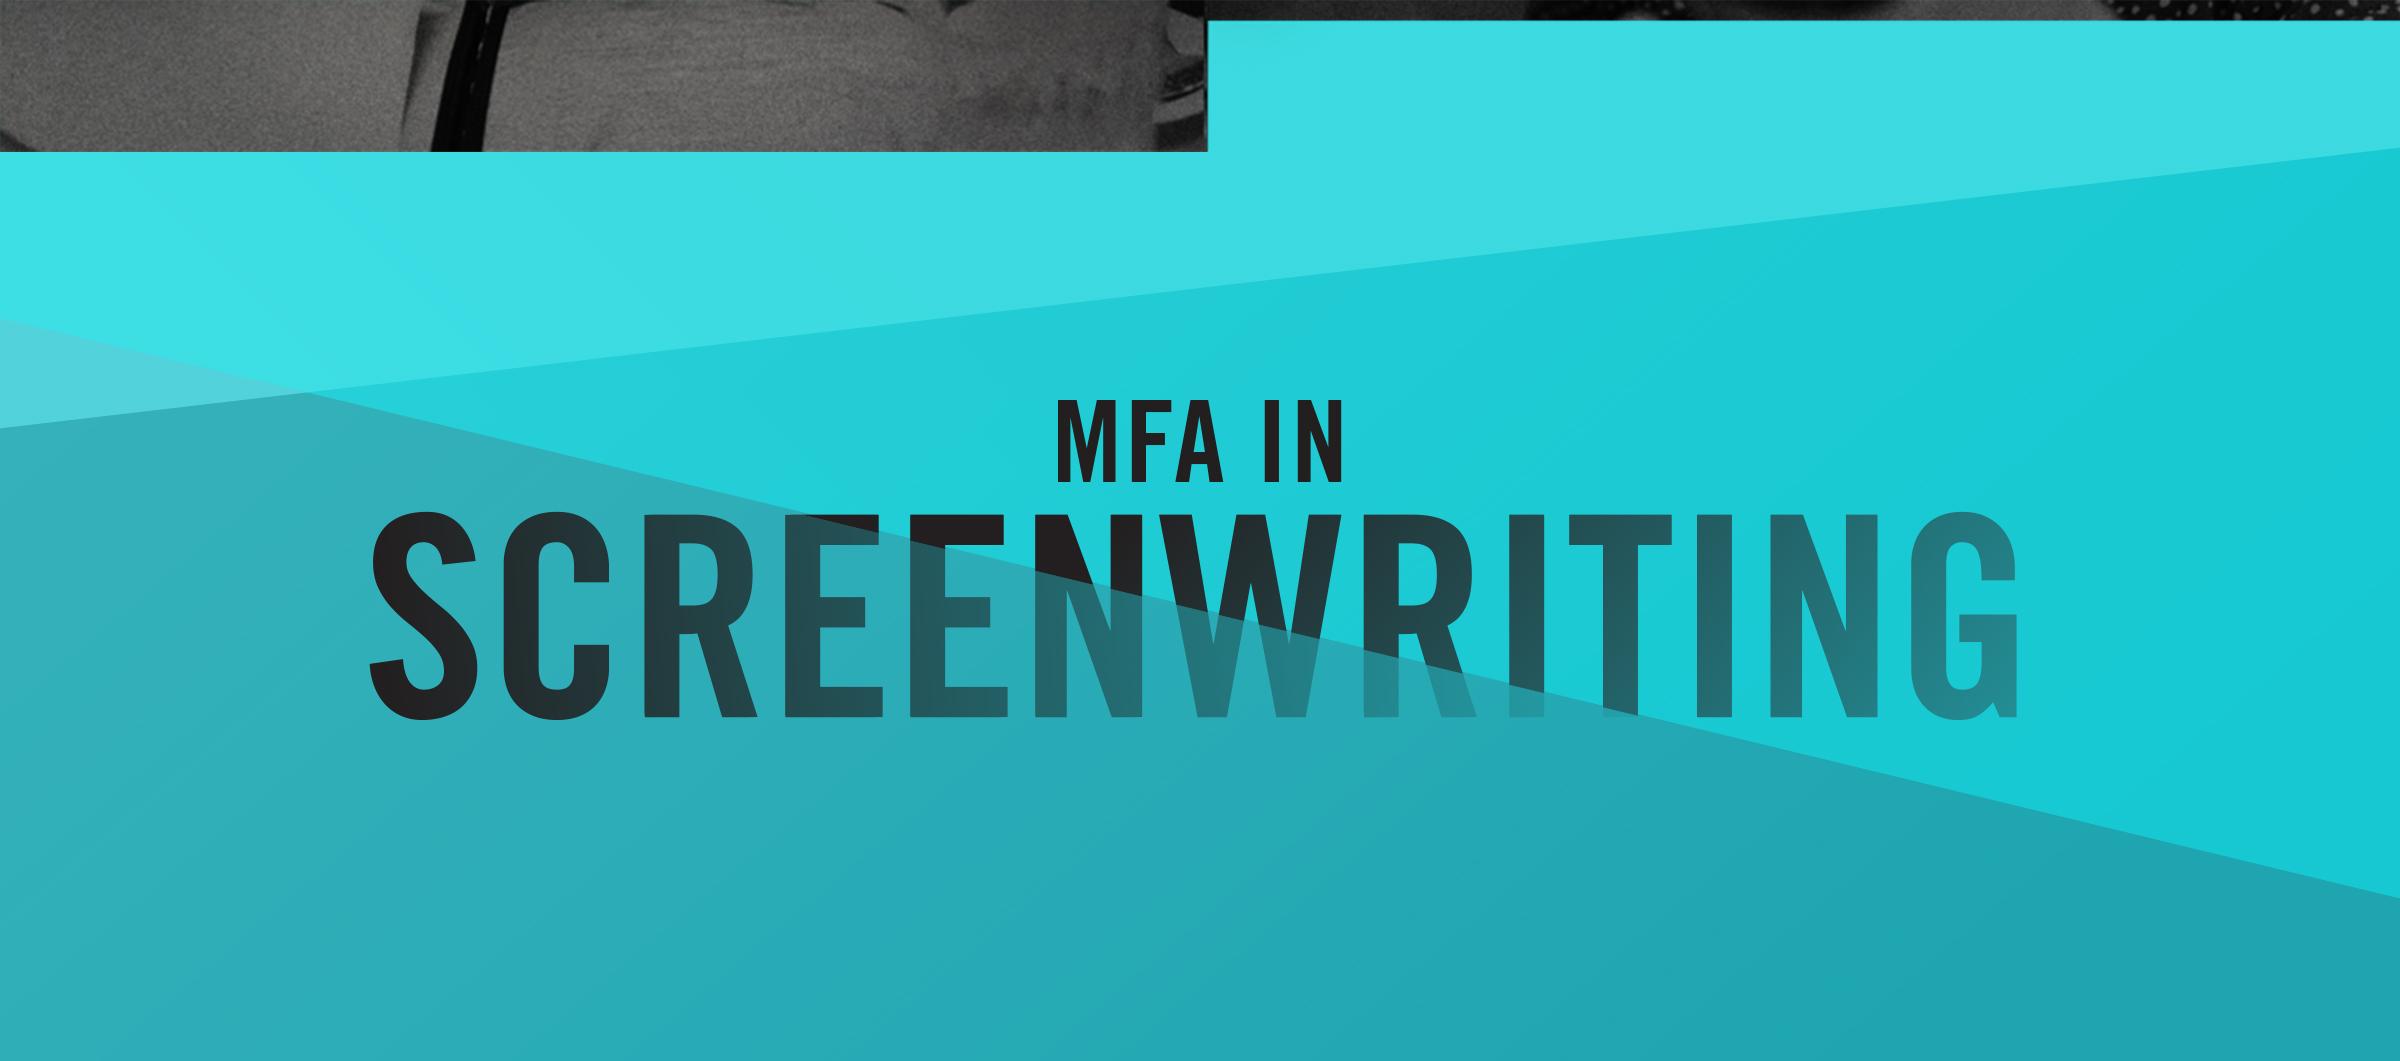 usc mfa screenwriting admissions